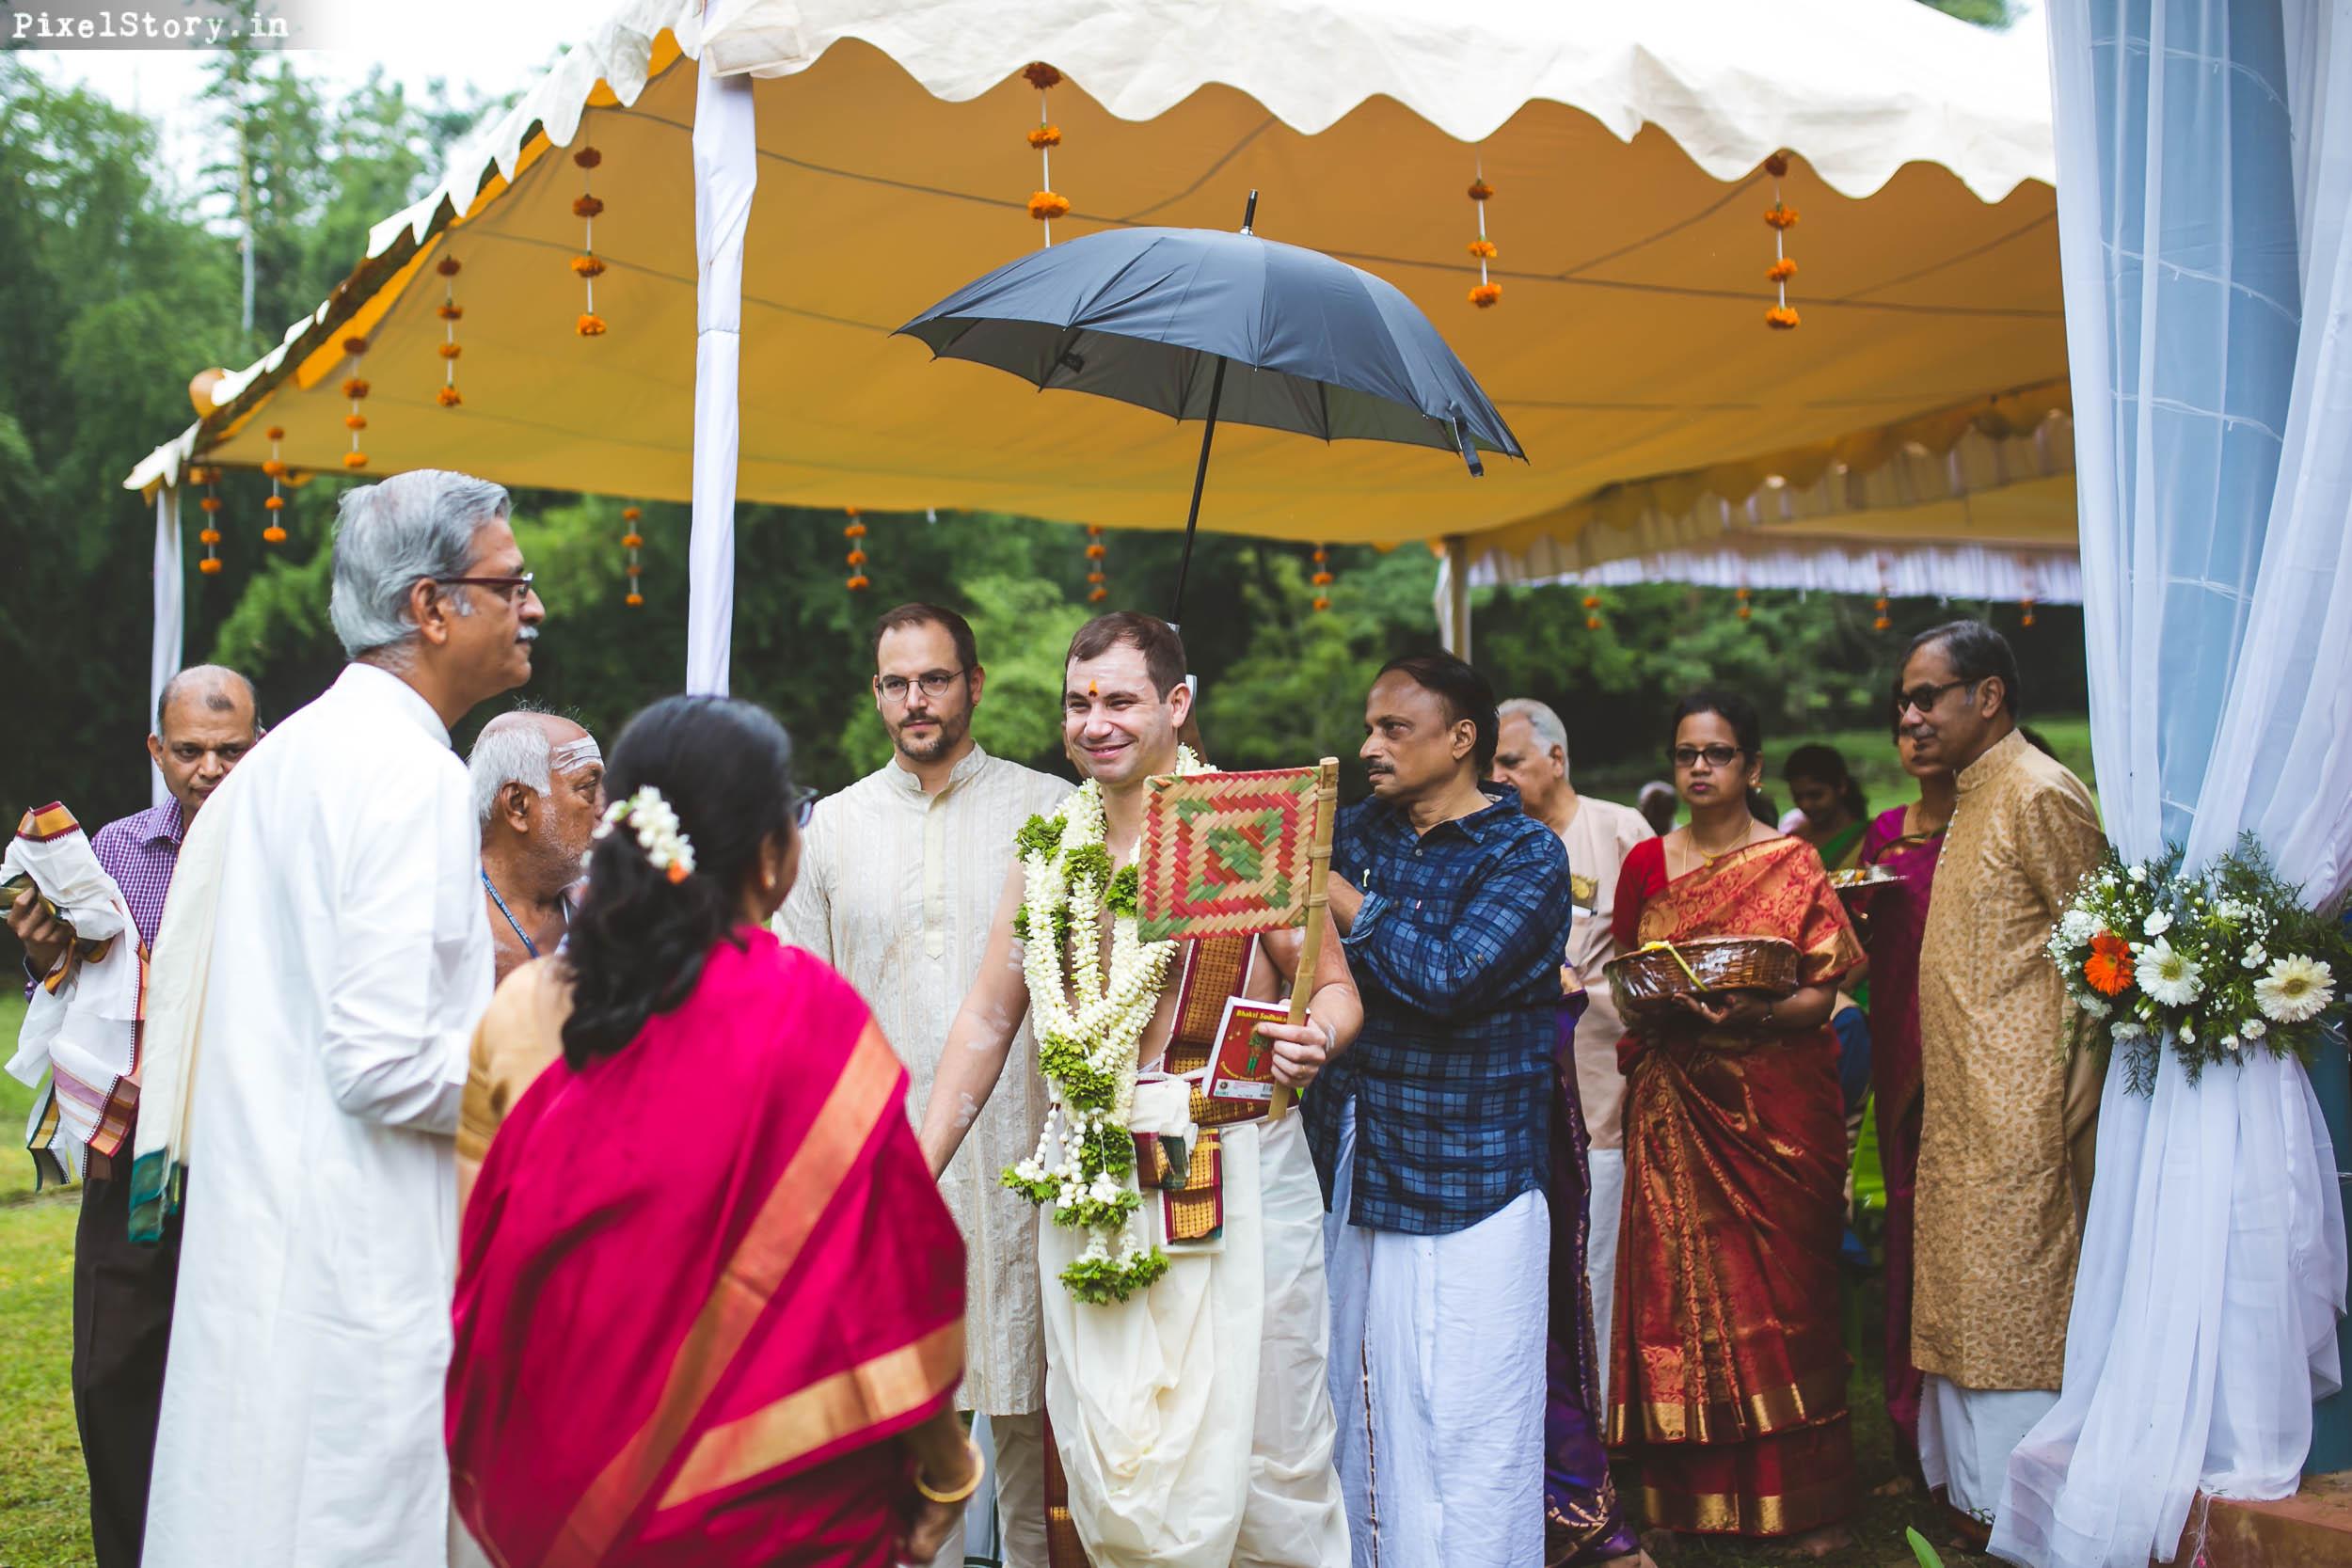 PixelStory-Jungle-Wedding-Photographer-Masinagudi-Indo-French026.jpg